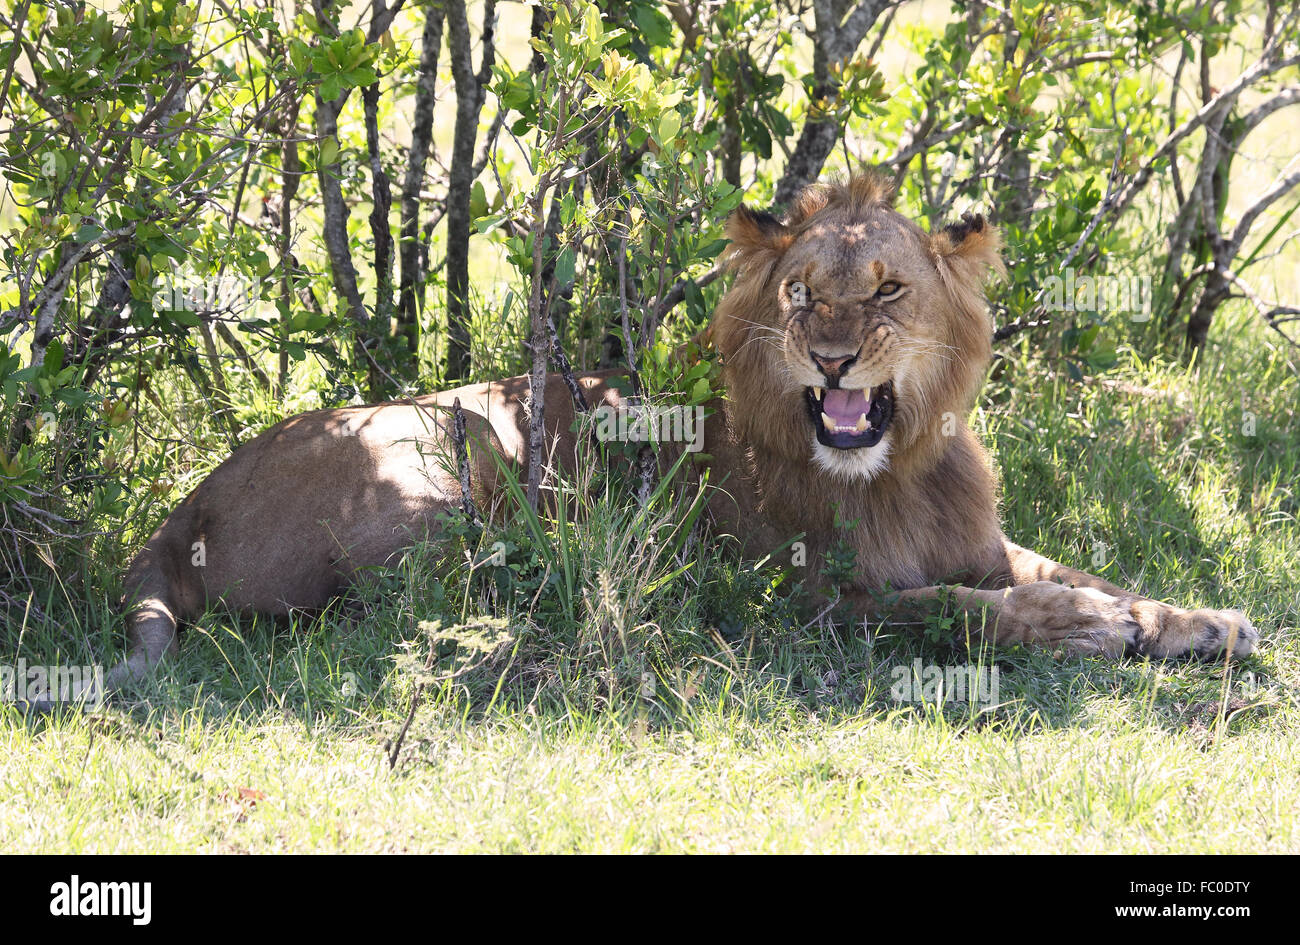 angry lion - Stock Image